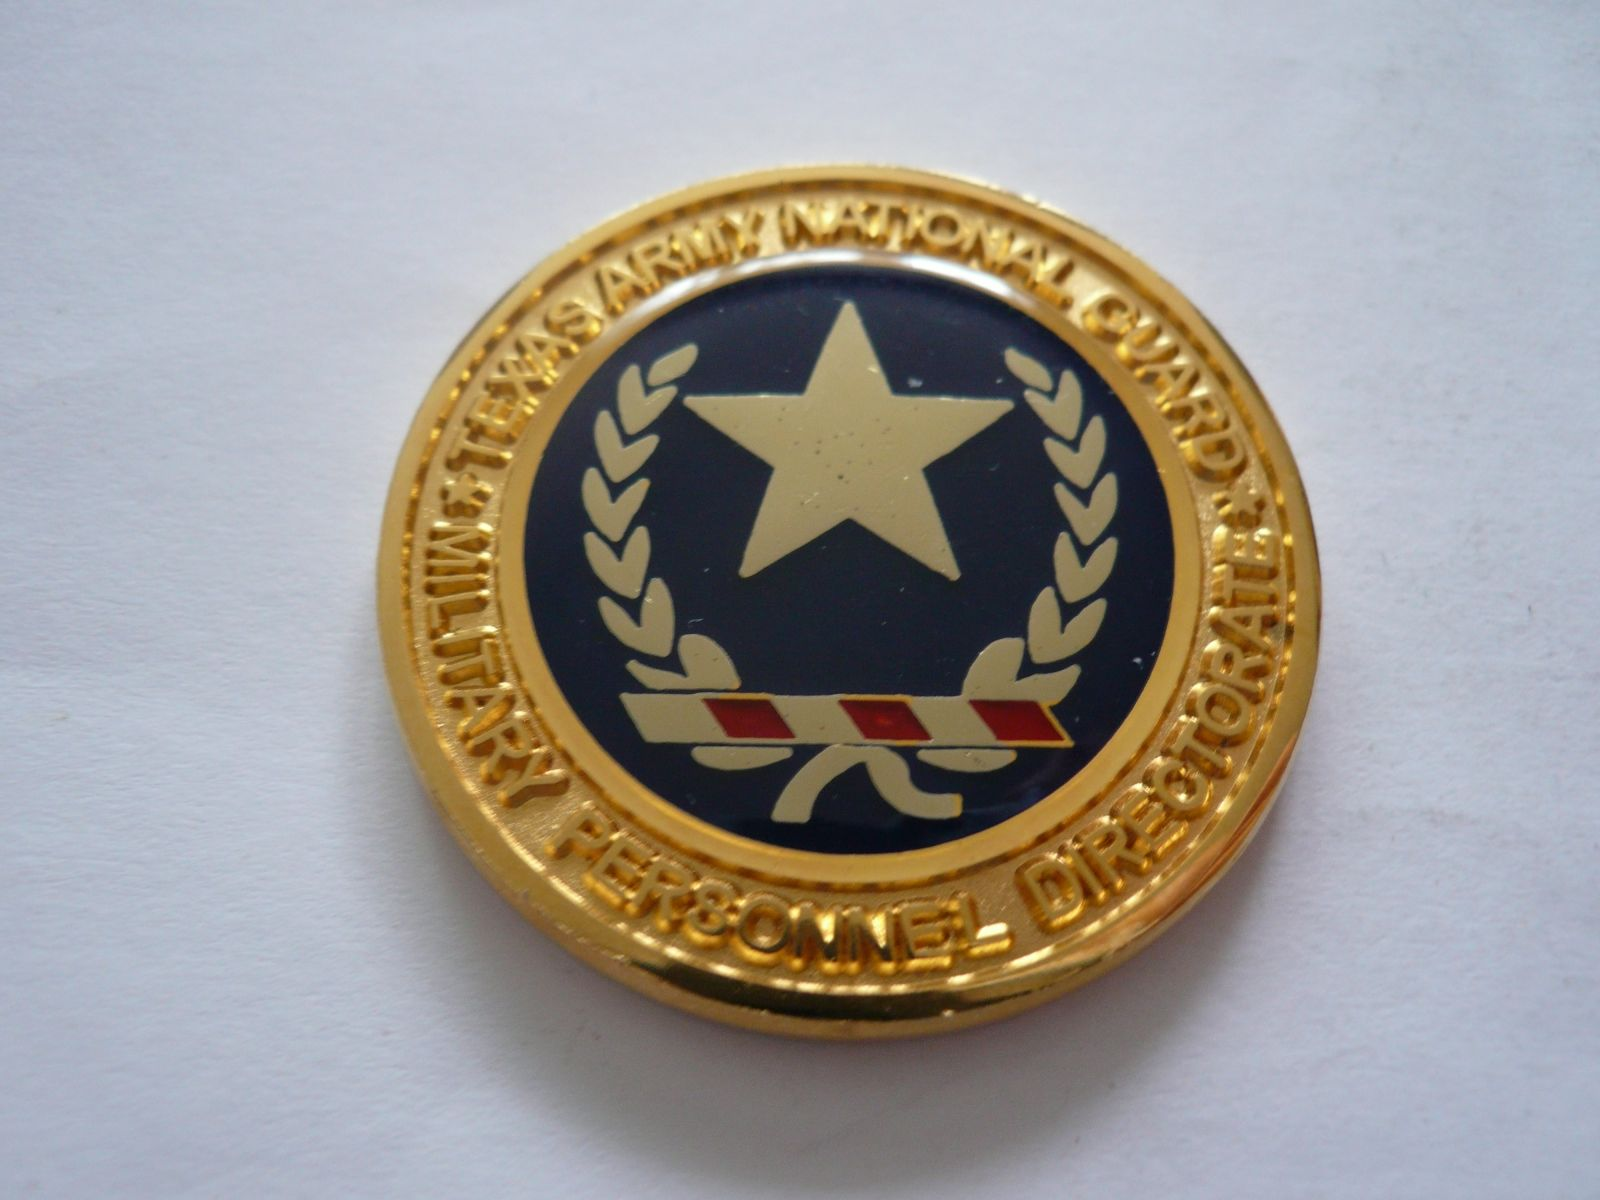 Army National, USA